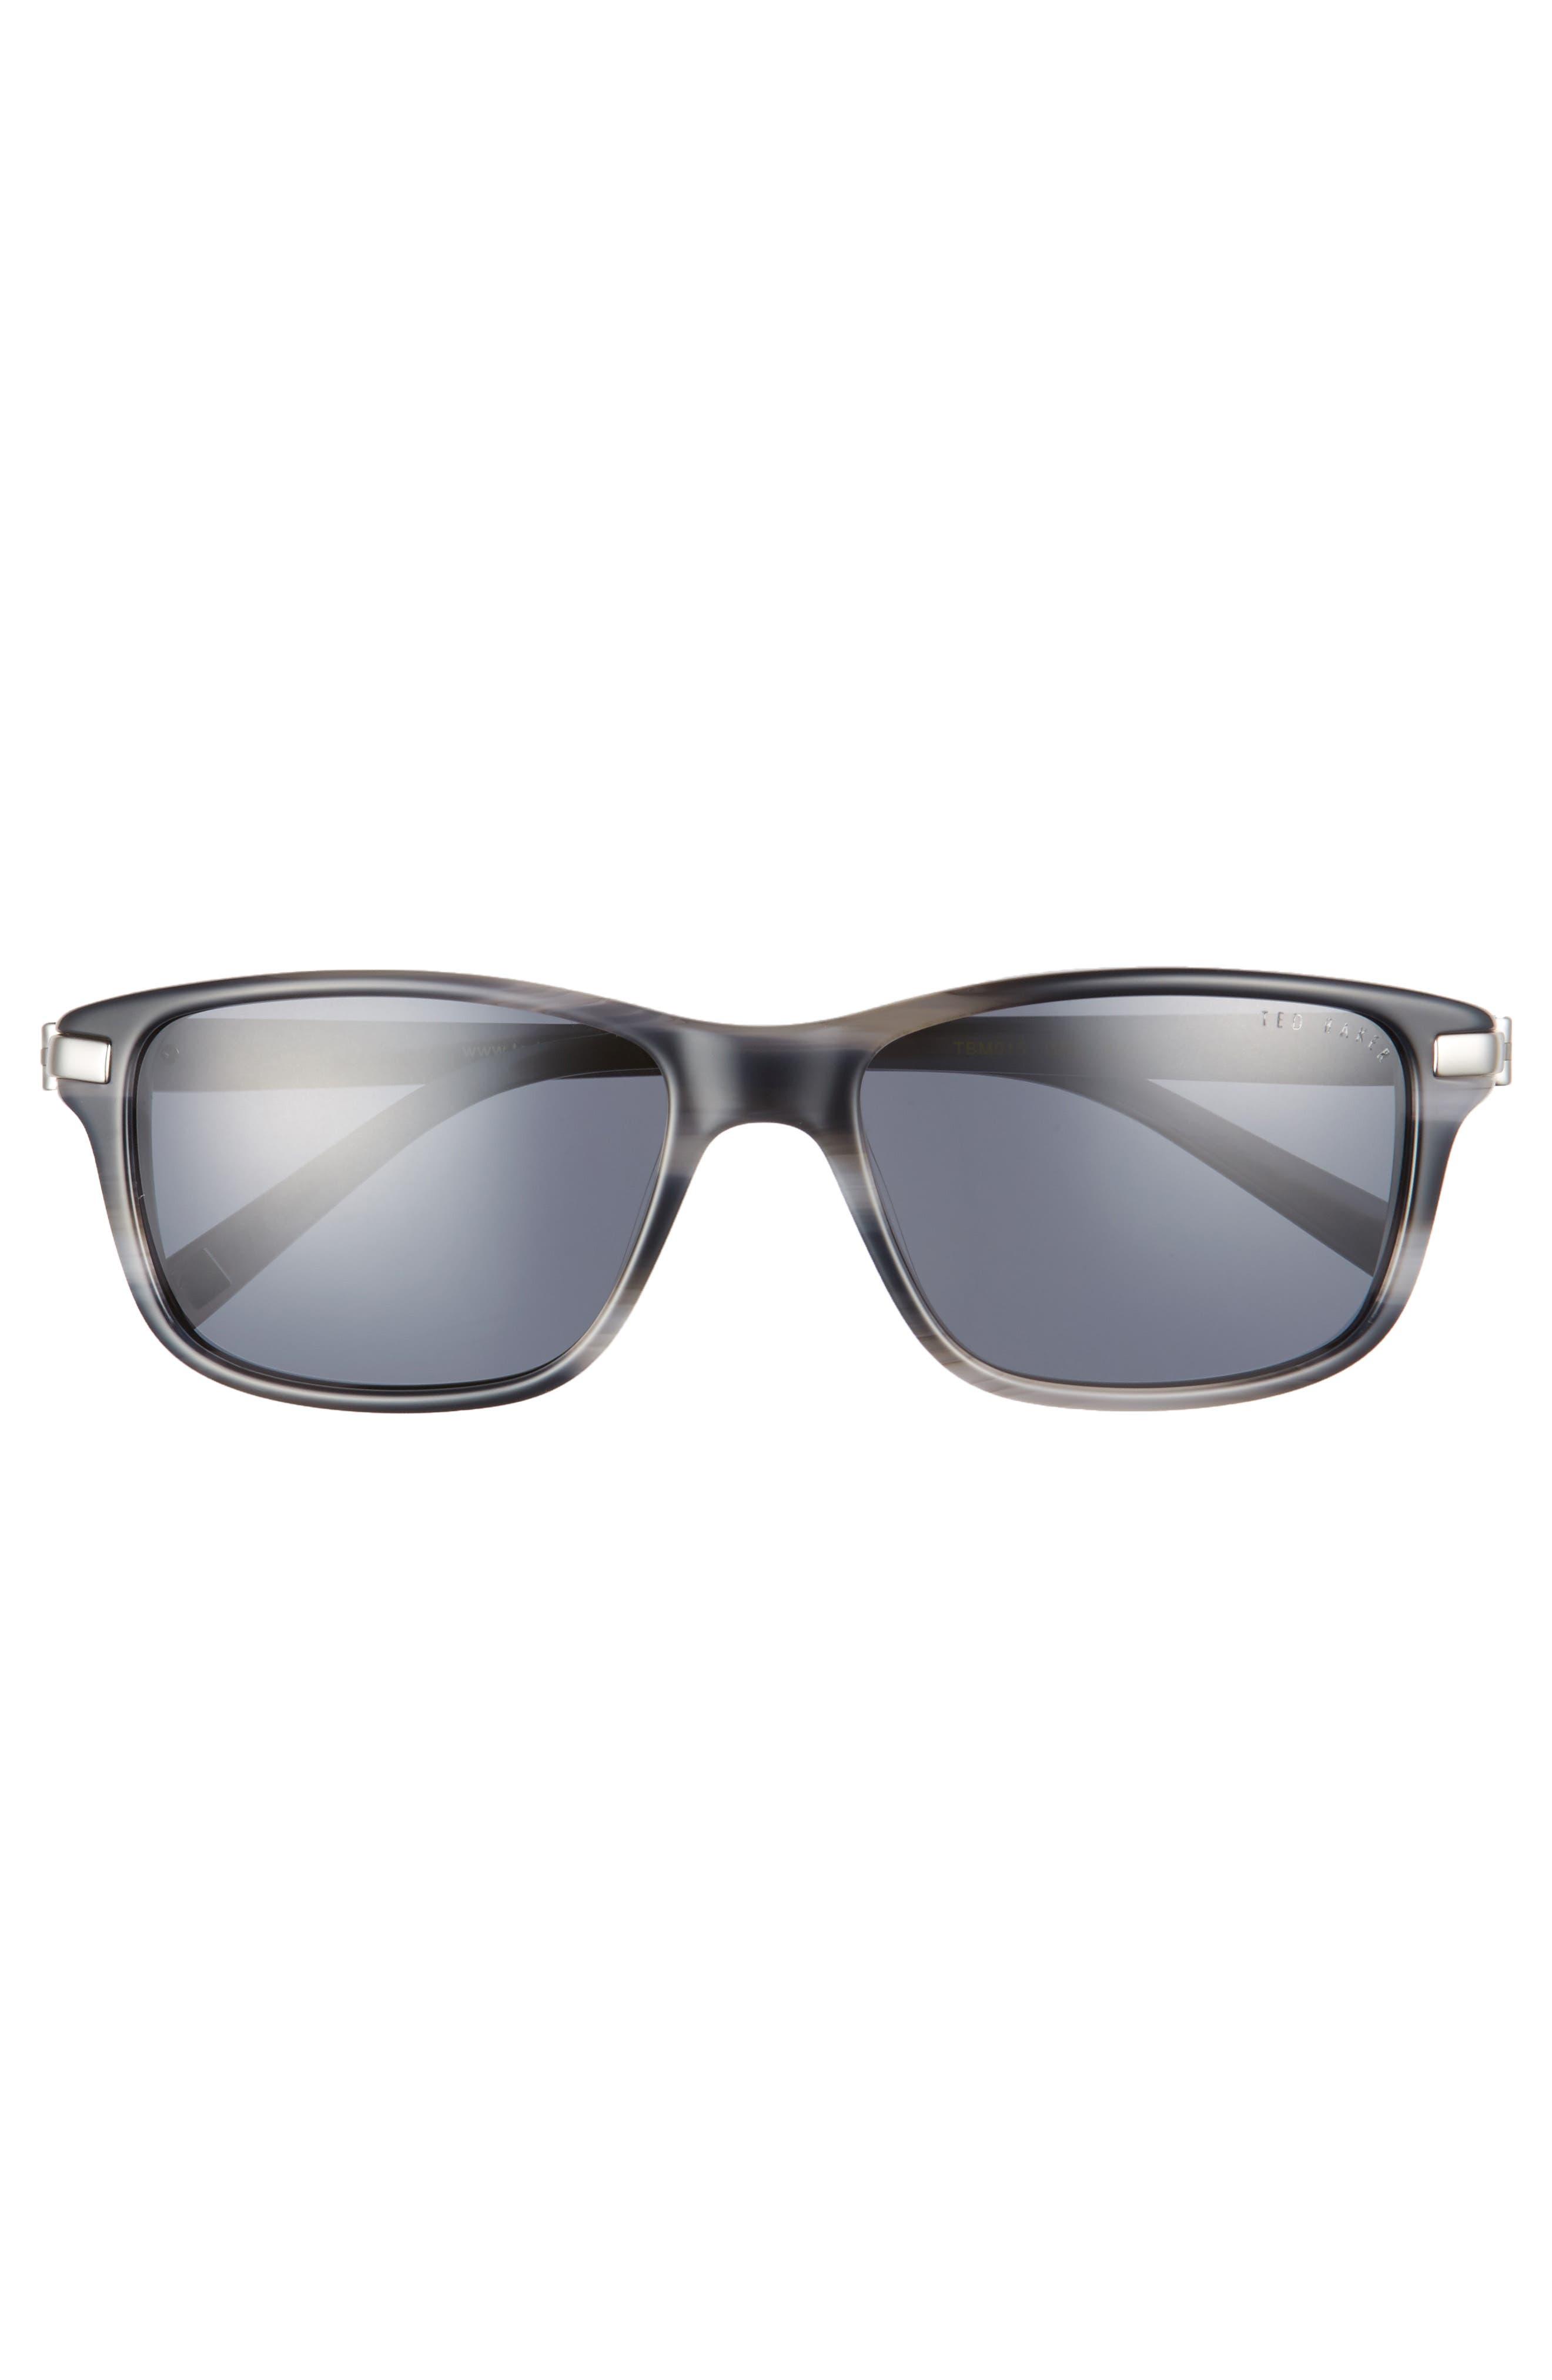 55mm Polarized Sunglasses,                             Alternate thumbnail 2, color,                             Grey